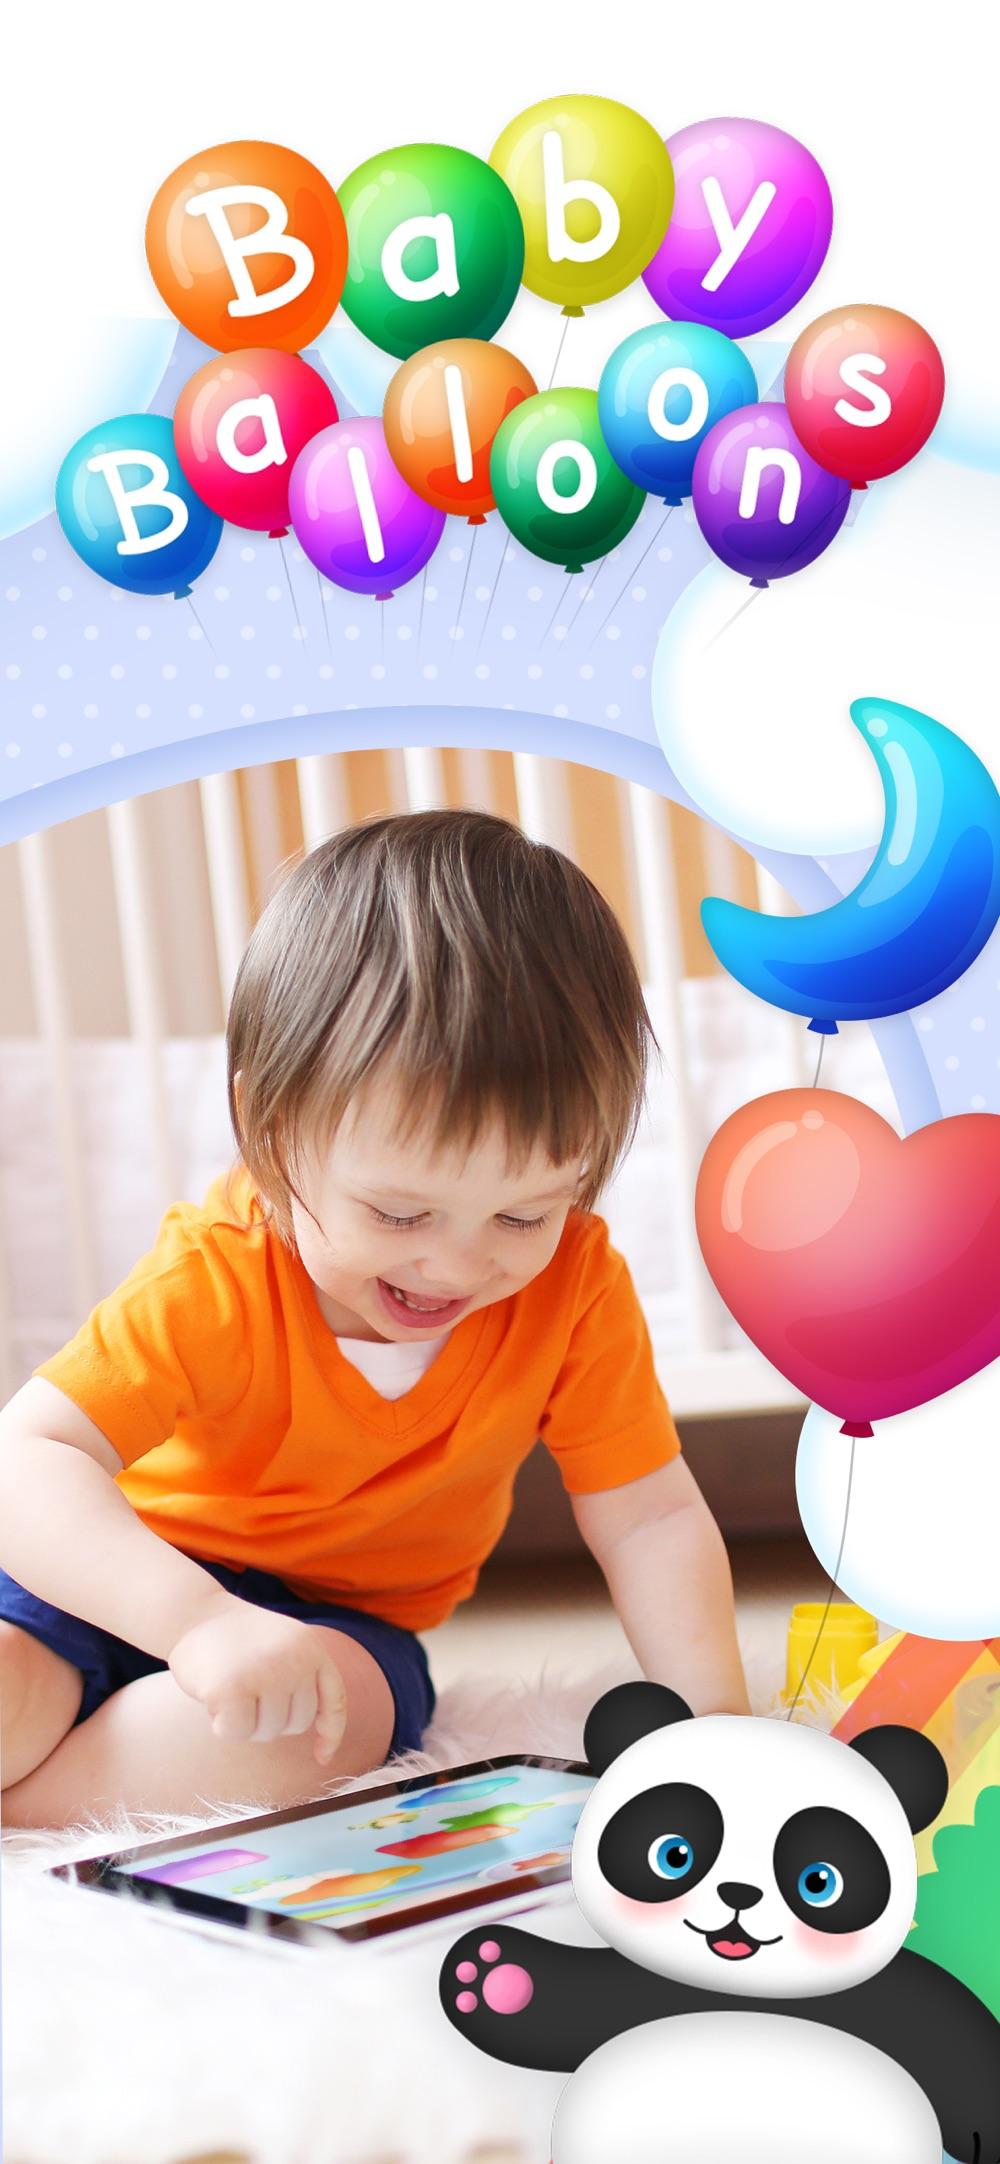 Educational Balloons & Bubbles